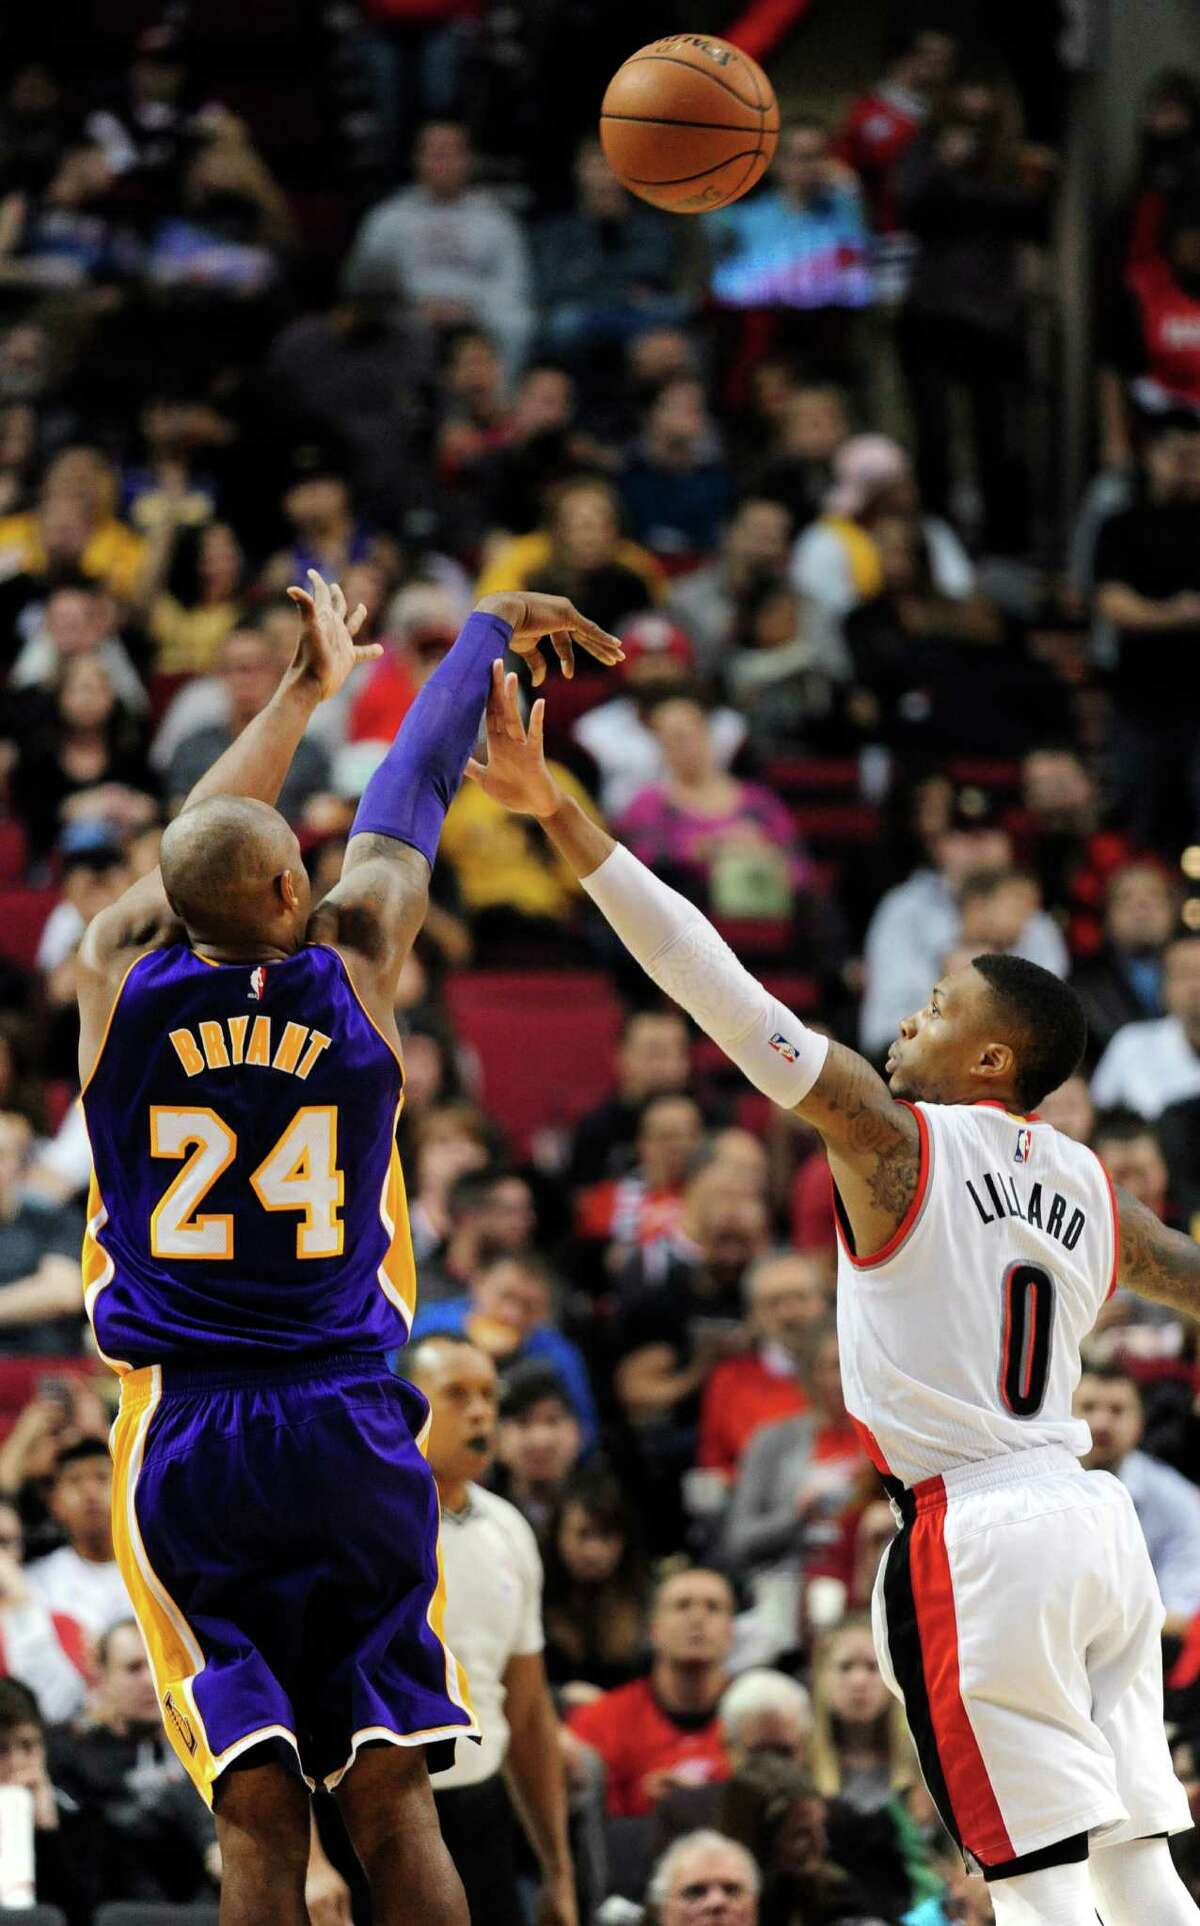 Los Angeles Lakers forward Kobe Bryant (24) shoots over Portland Trail Blazers guard Damian Lillard (0) during the second half of an NBA basketball game Saturday, Nov. 28, 2015, in Portland, Ore. The Blazers won 108-96. (AP Photo/Steve Dykes) ORG XMIT: ORSD113